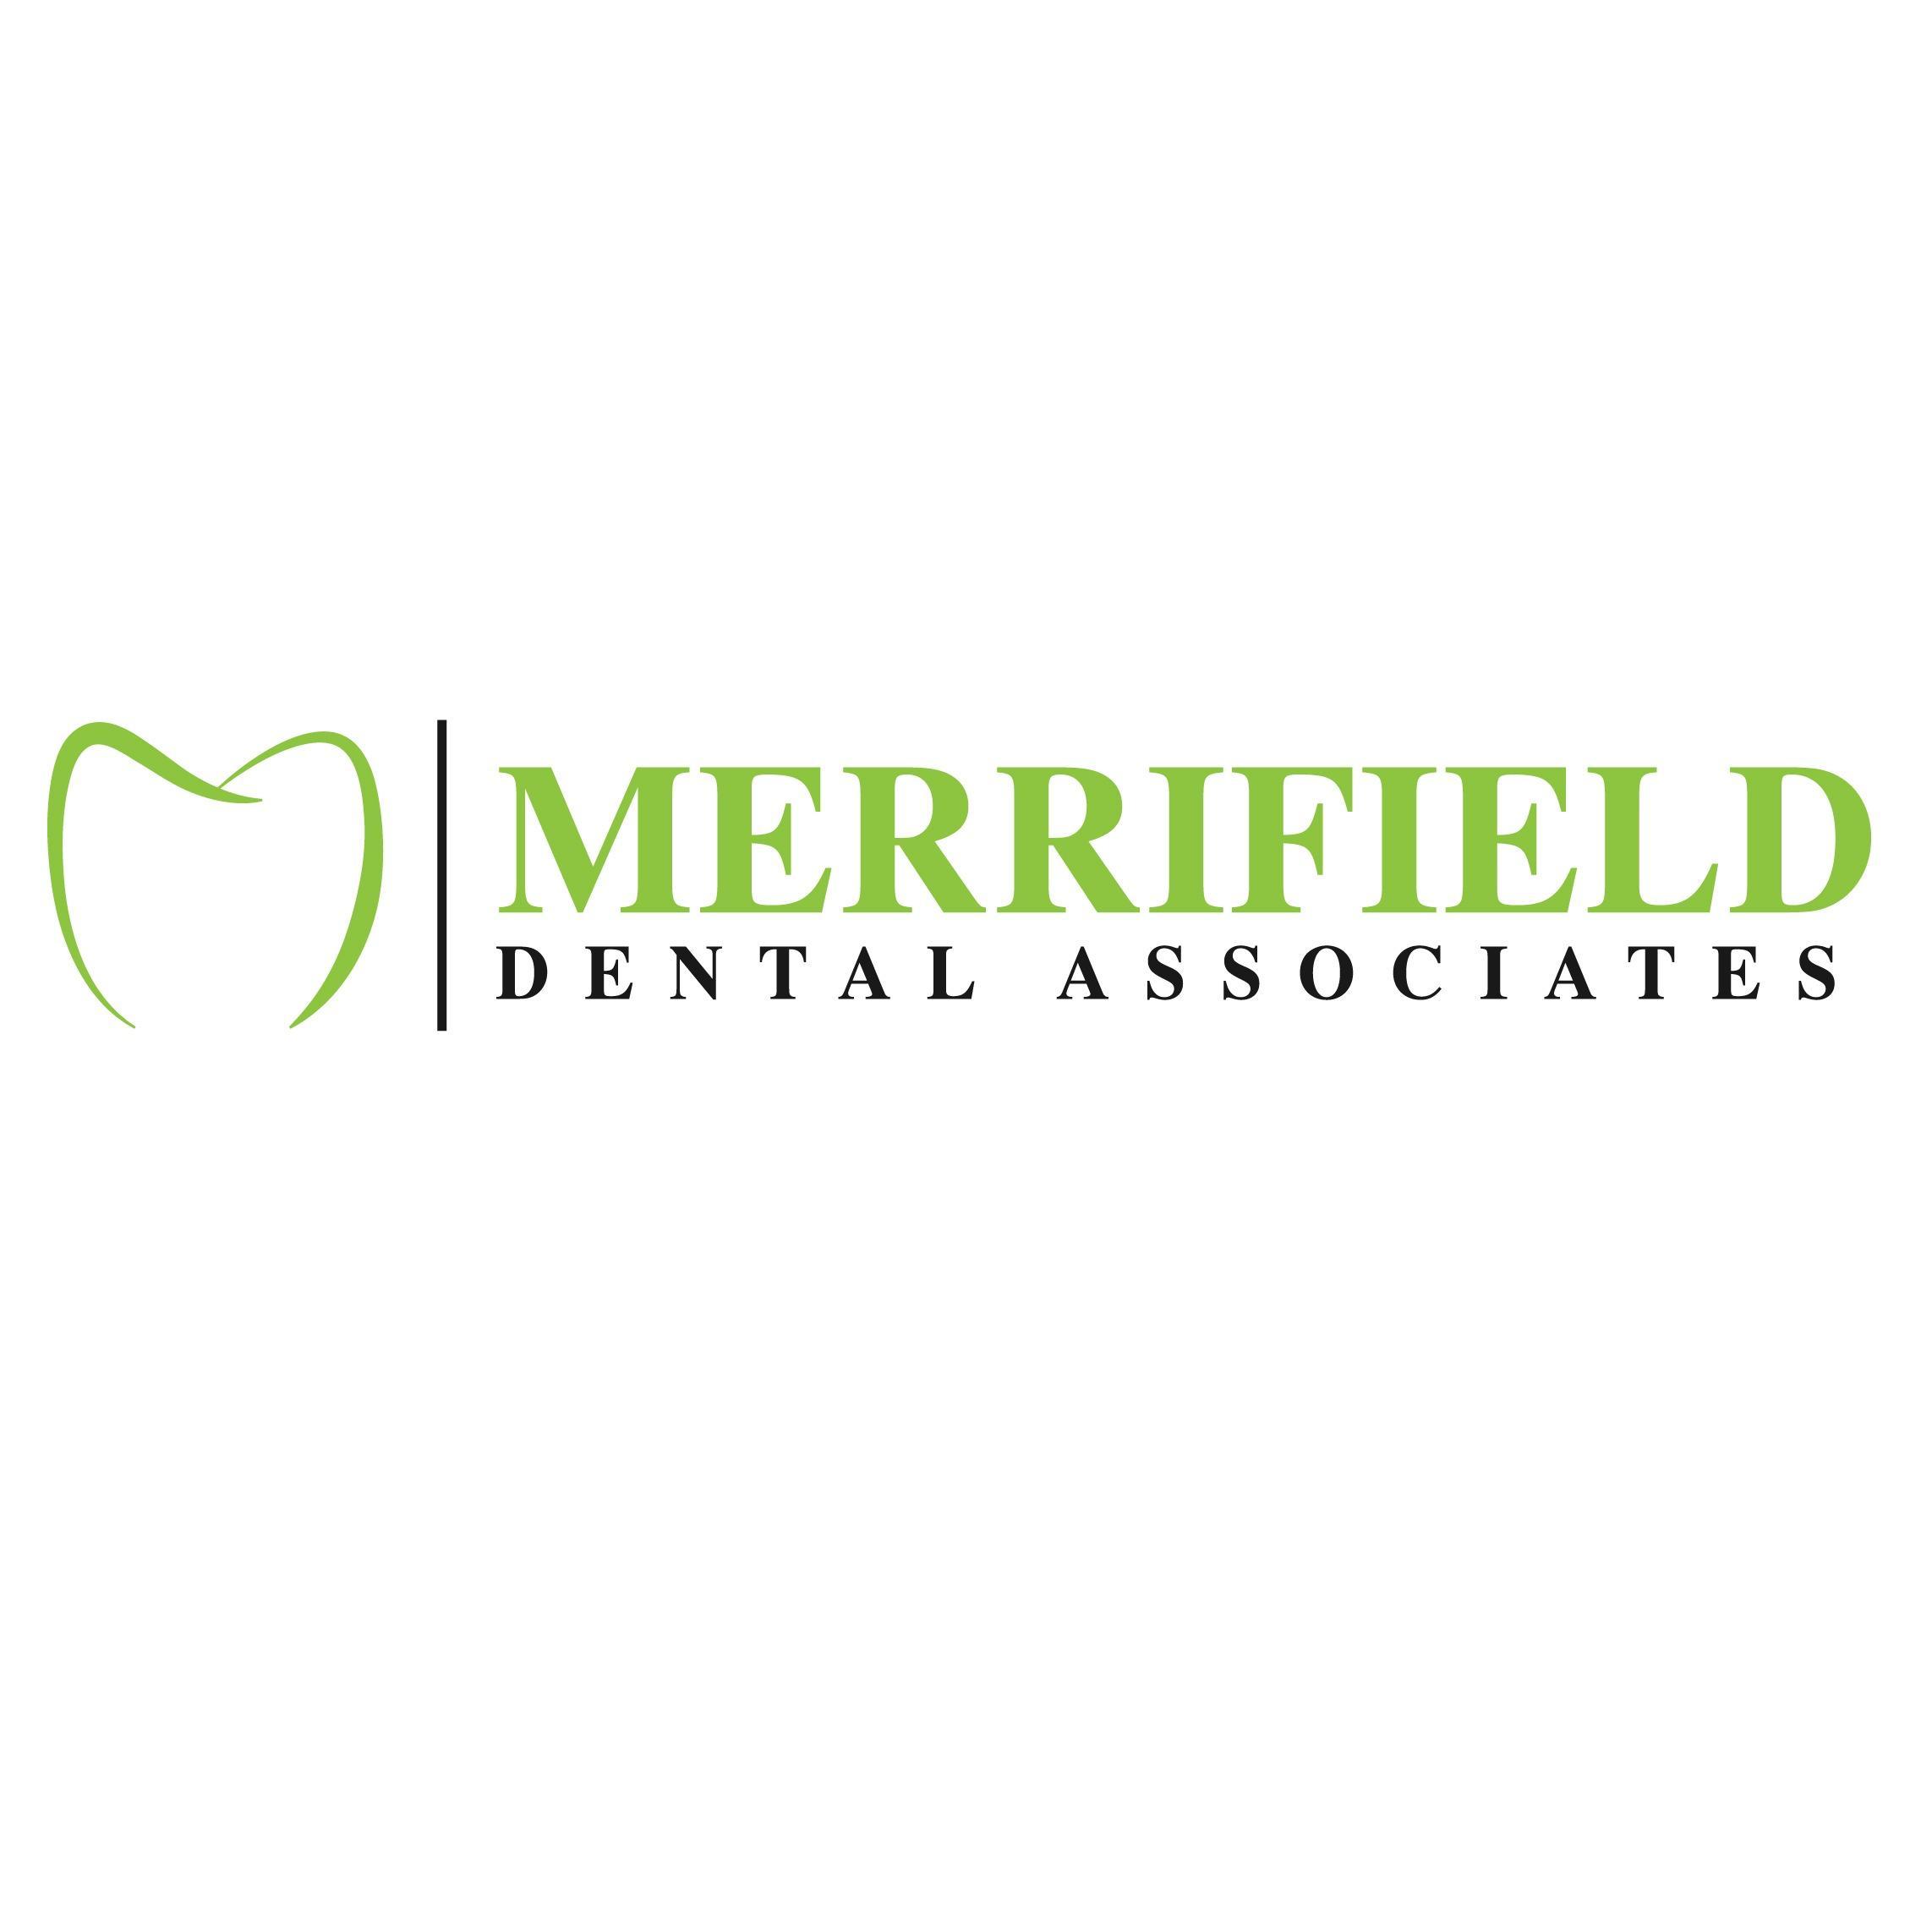 Merrifield Dental Associates LLC